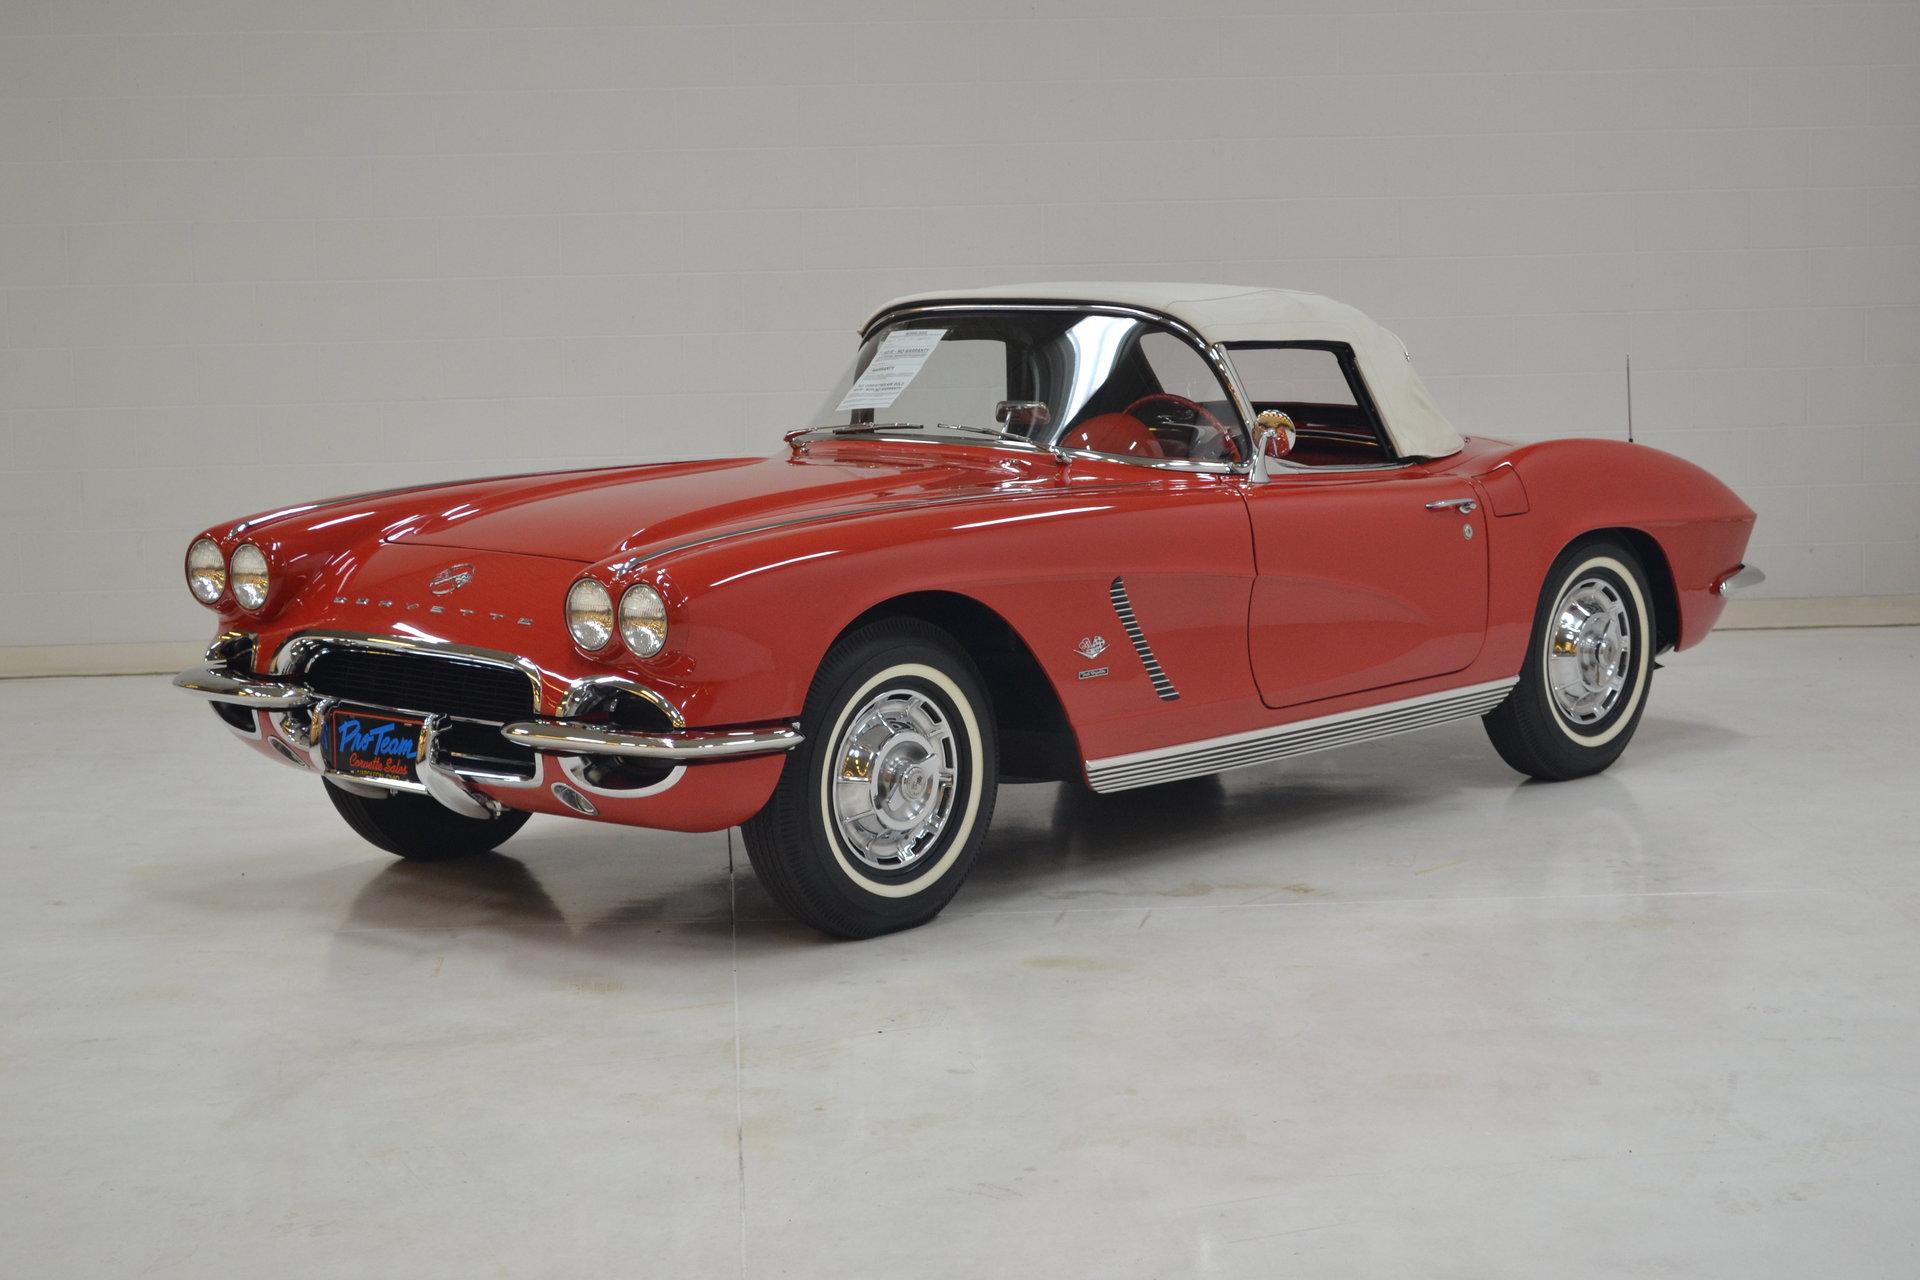 610061e6d50c0 hd 1962 chevrolet corvette